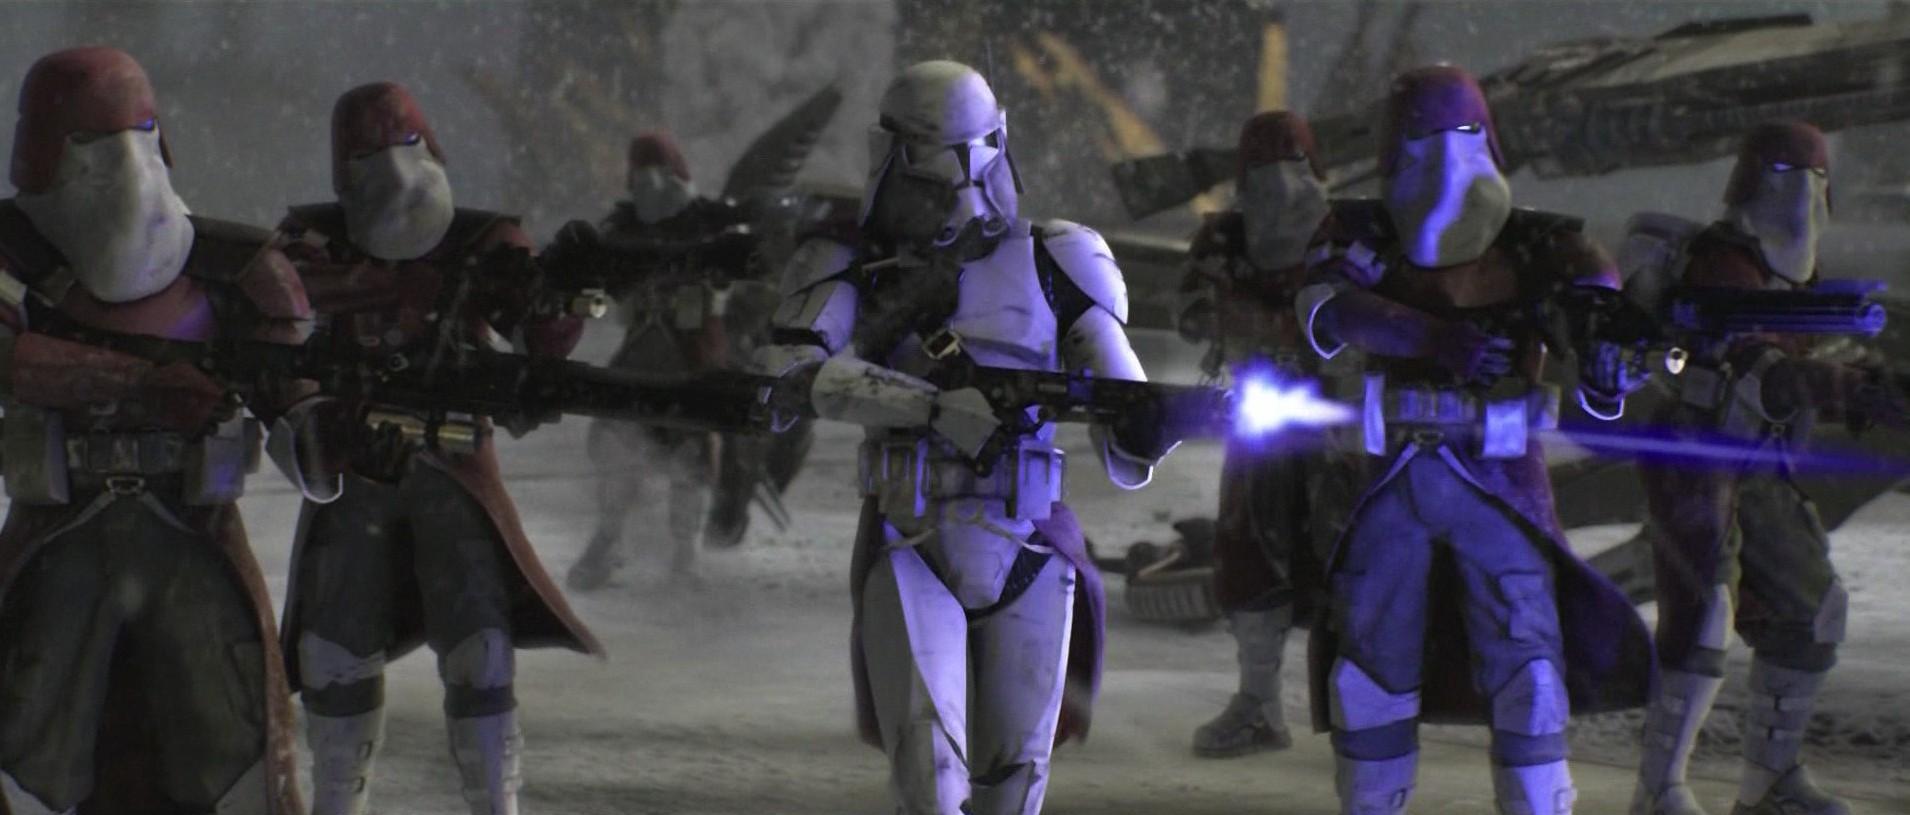 73 Star Wars Clone Trooper Wallpaper On Wallpapersafari